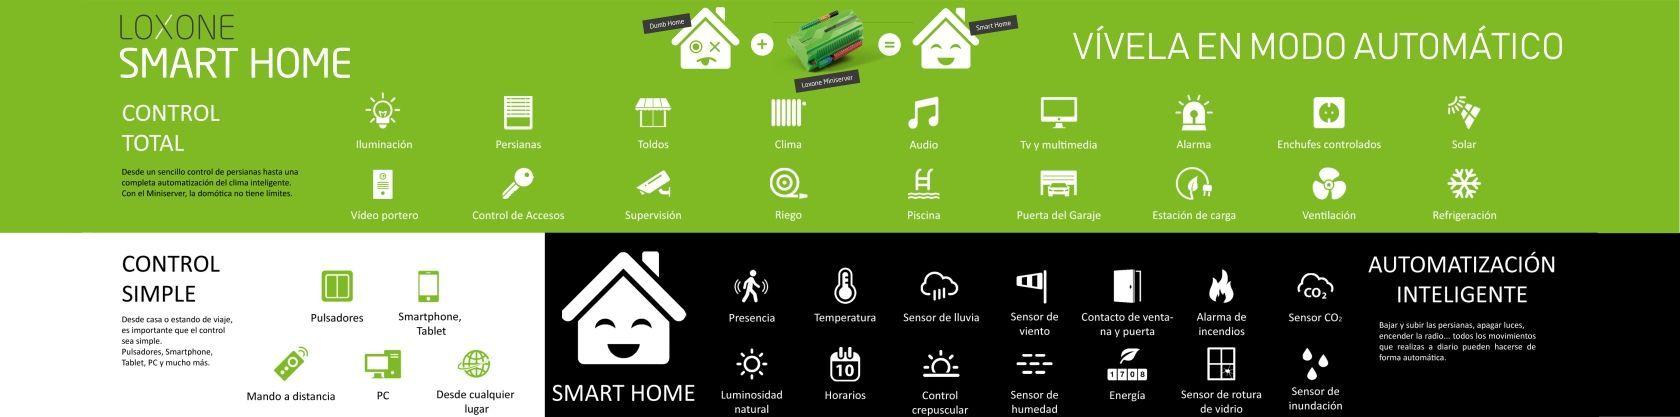 loxone smart home inel